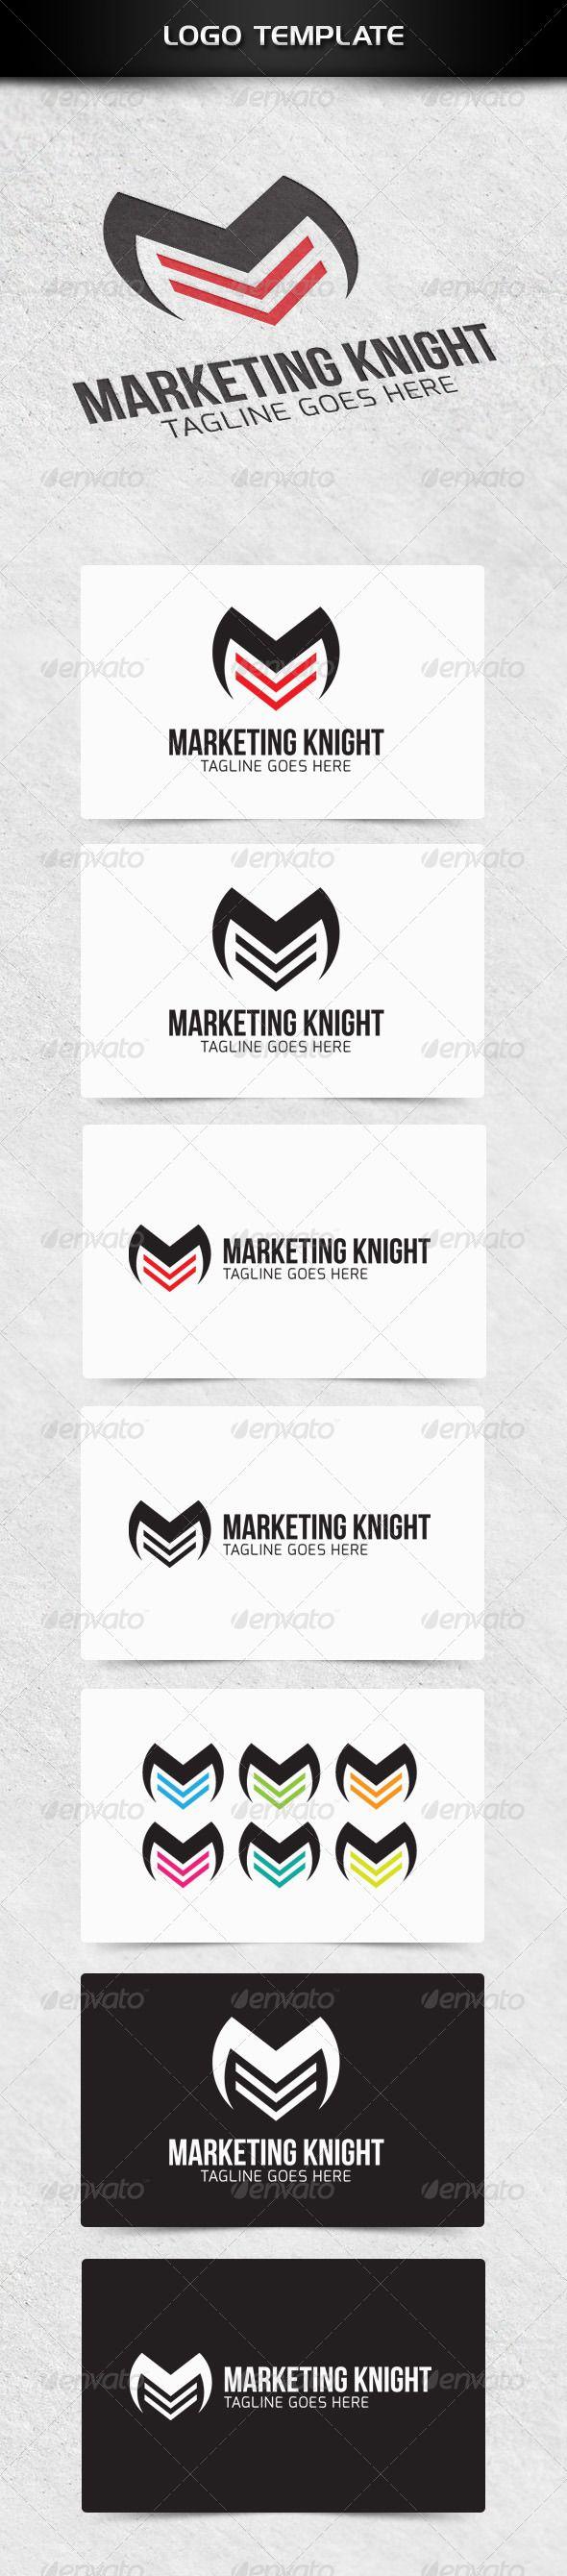 Marketing Knight Pinterest Knight Logo templates and Fonts